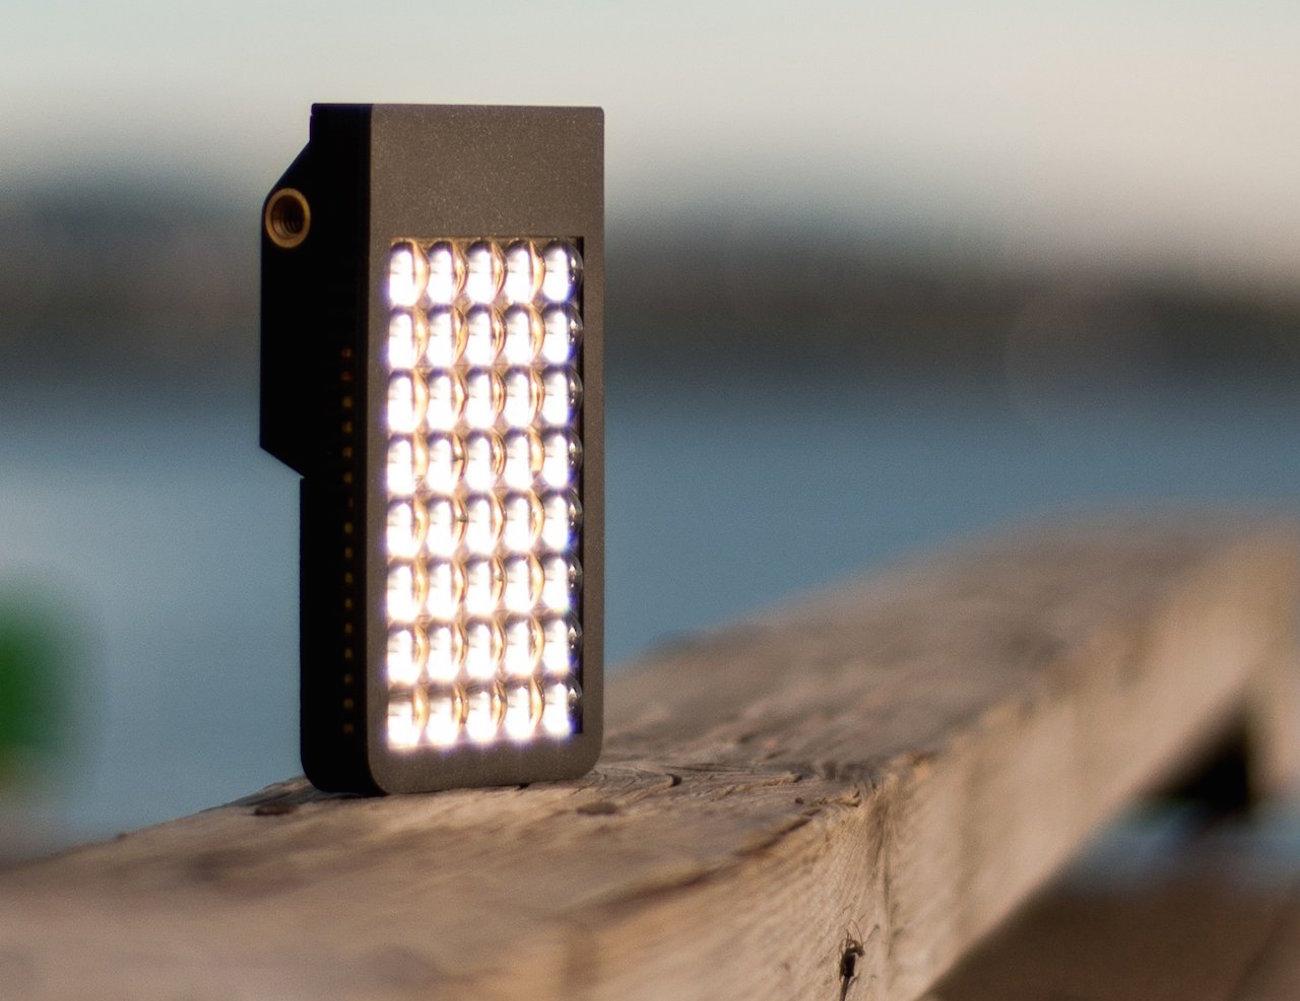 KICK Pocket Lighting Studio – Great Tool for Smartphone Photography